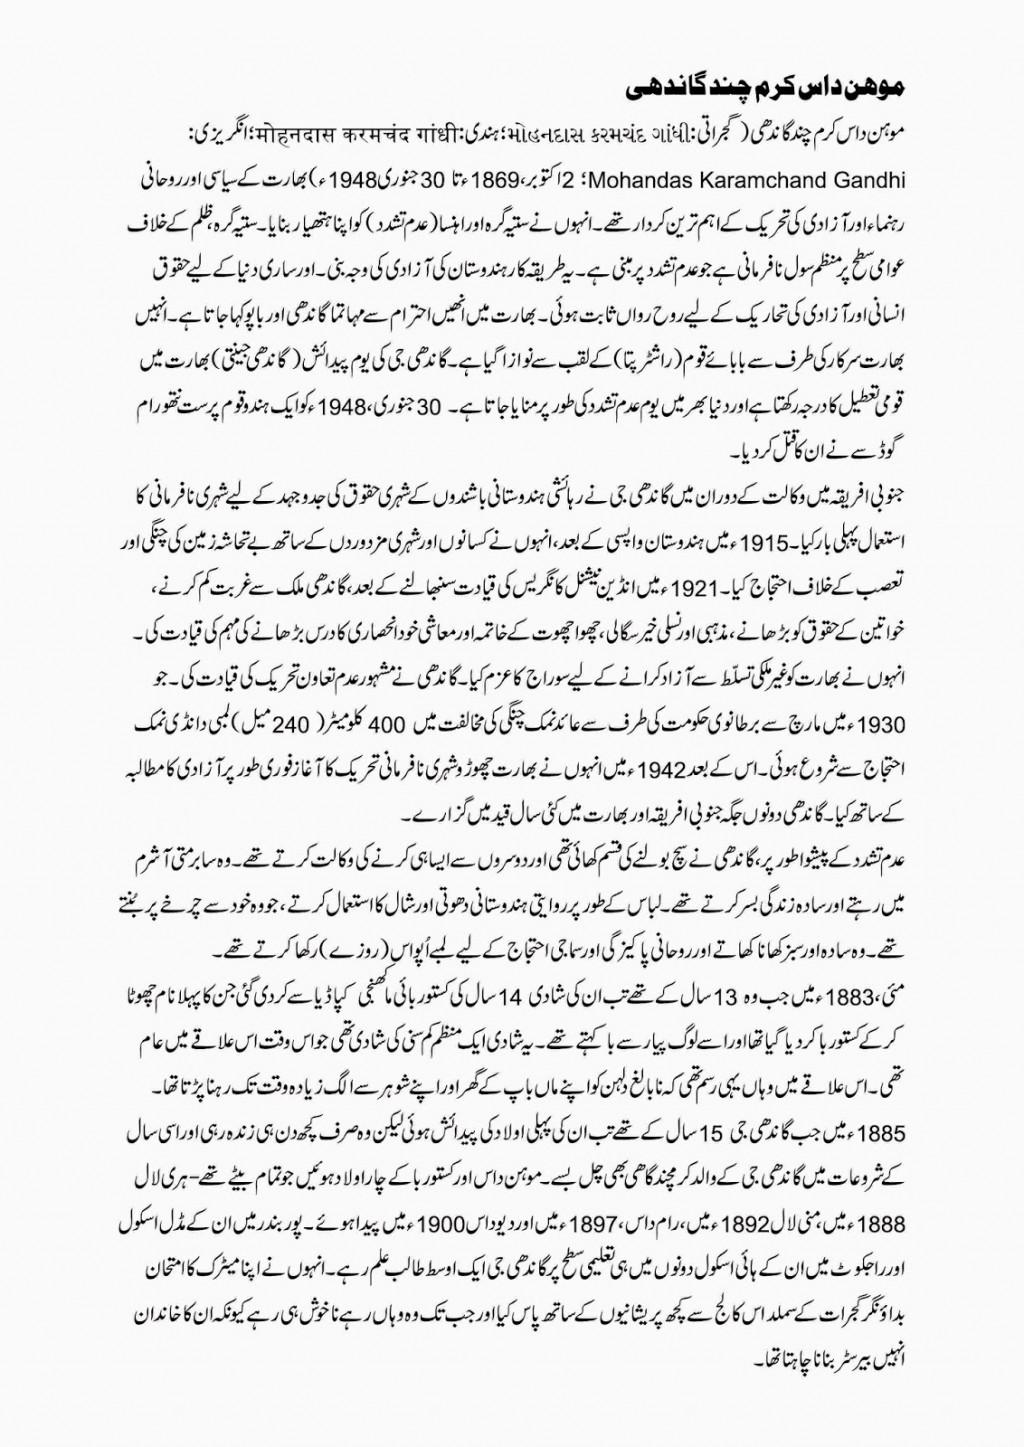 001 Mahatma Gandhi Essay In Urdu Essay2bmahatma2bgandhi2burdu2b1 Imposing Language Jayanti Speech Large